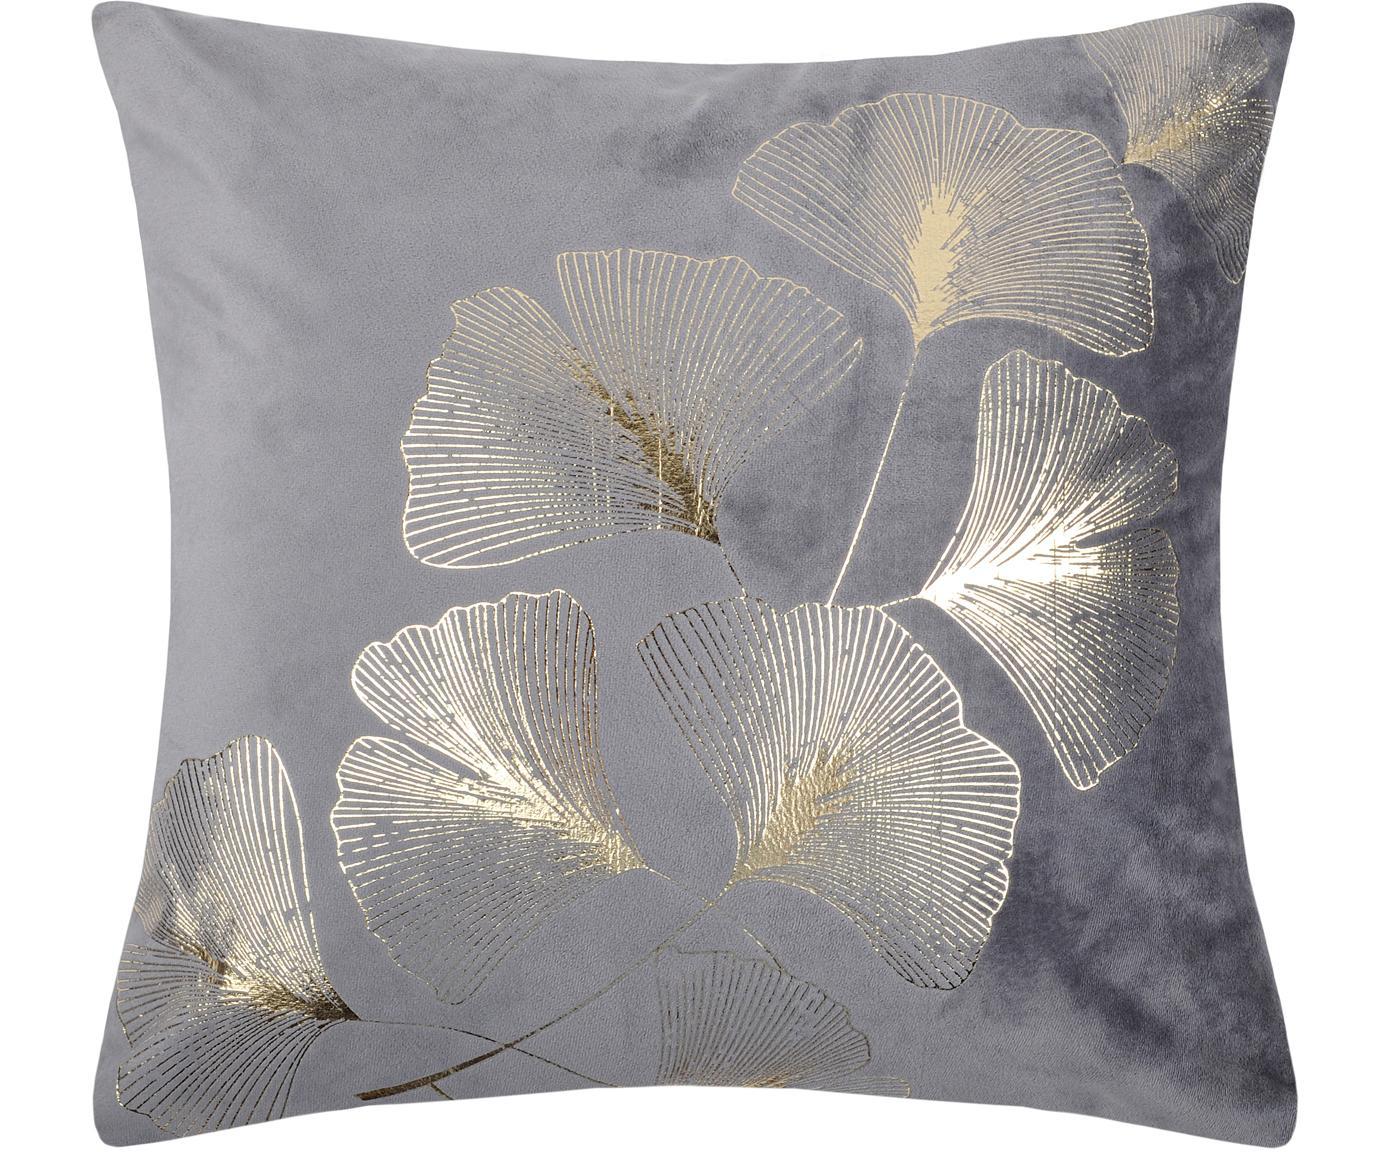 Cuscino in velluto con imbottitura Ginnan, Velluto, Grigio, oro, Larg. 40 x Lung. 40 cm